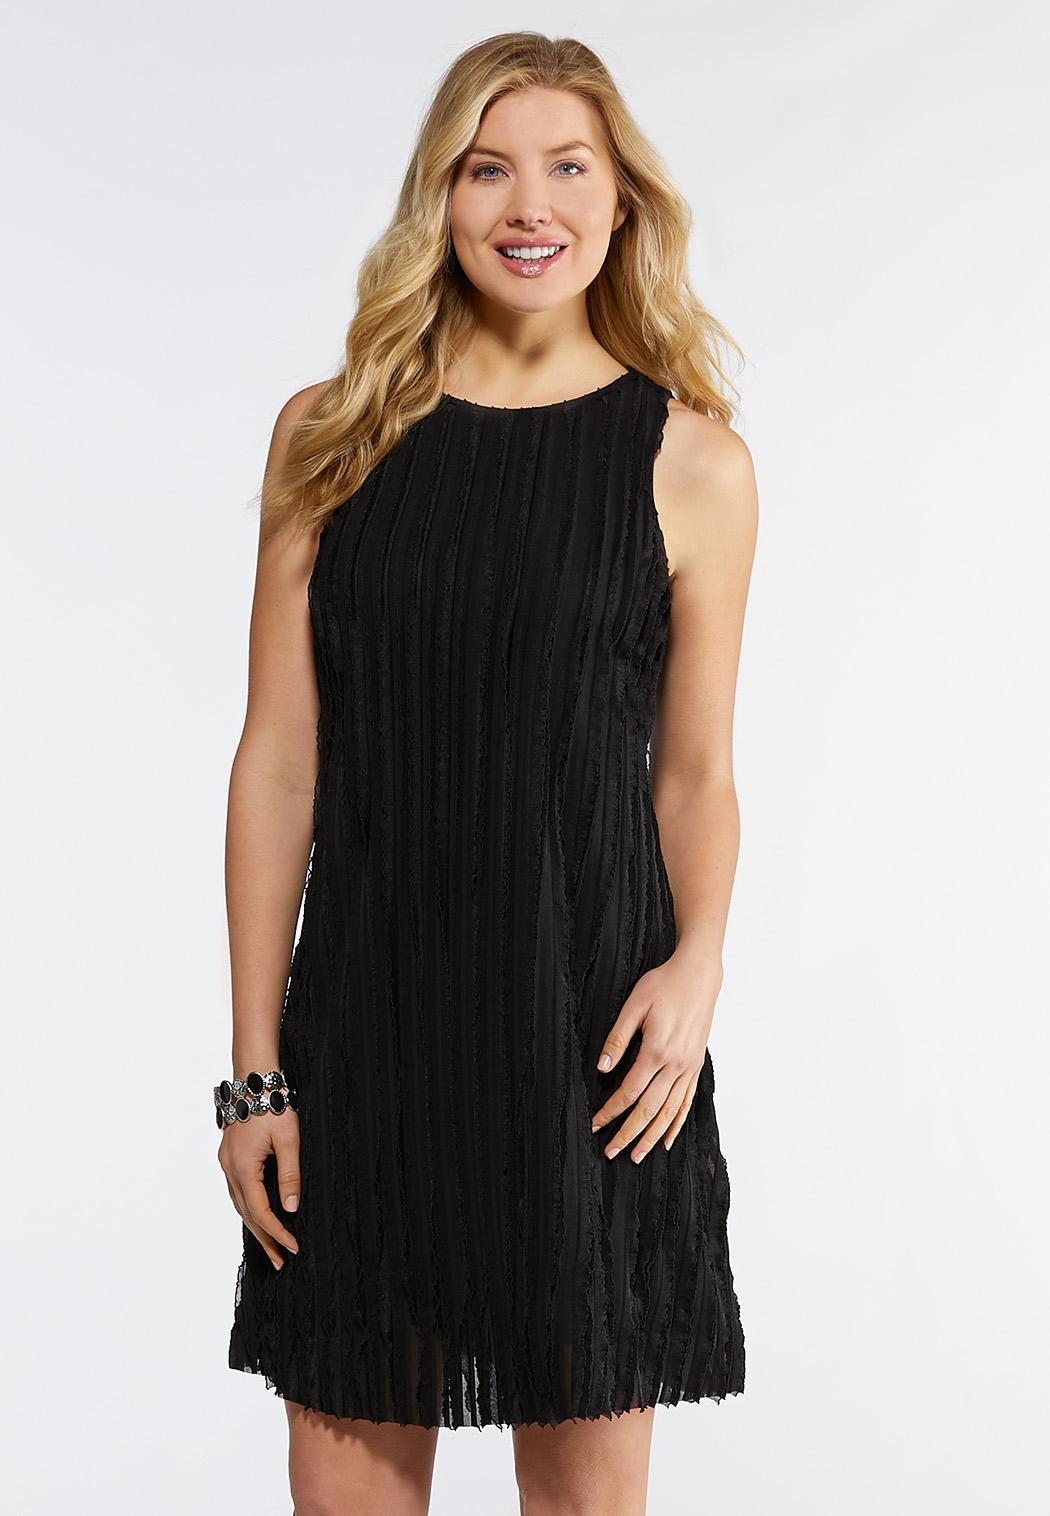 1eec24ec477 Plus Size Eyelash Ruffle Swing Dress A-line   Swing Cato Fashions